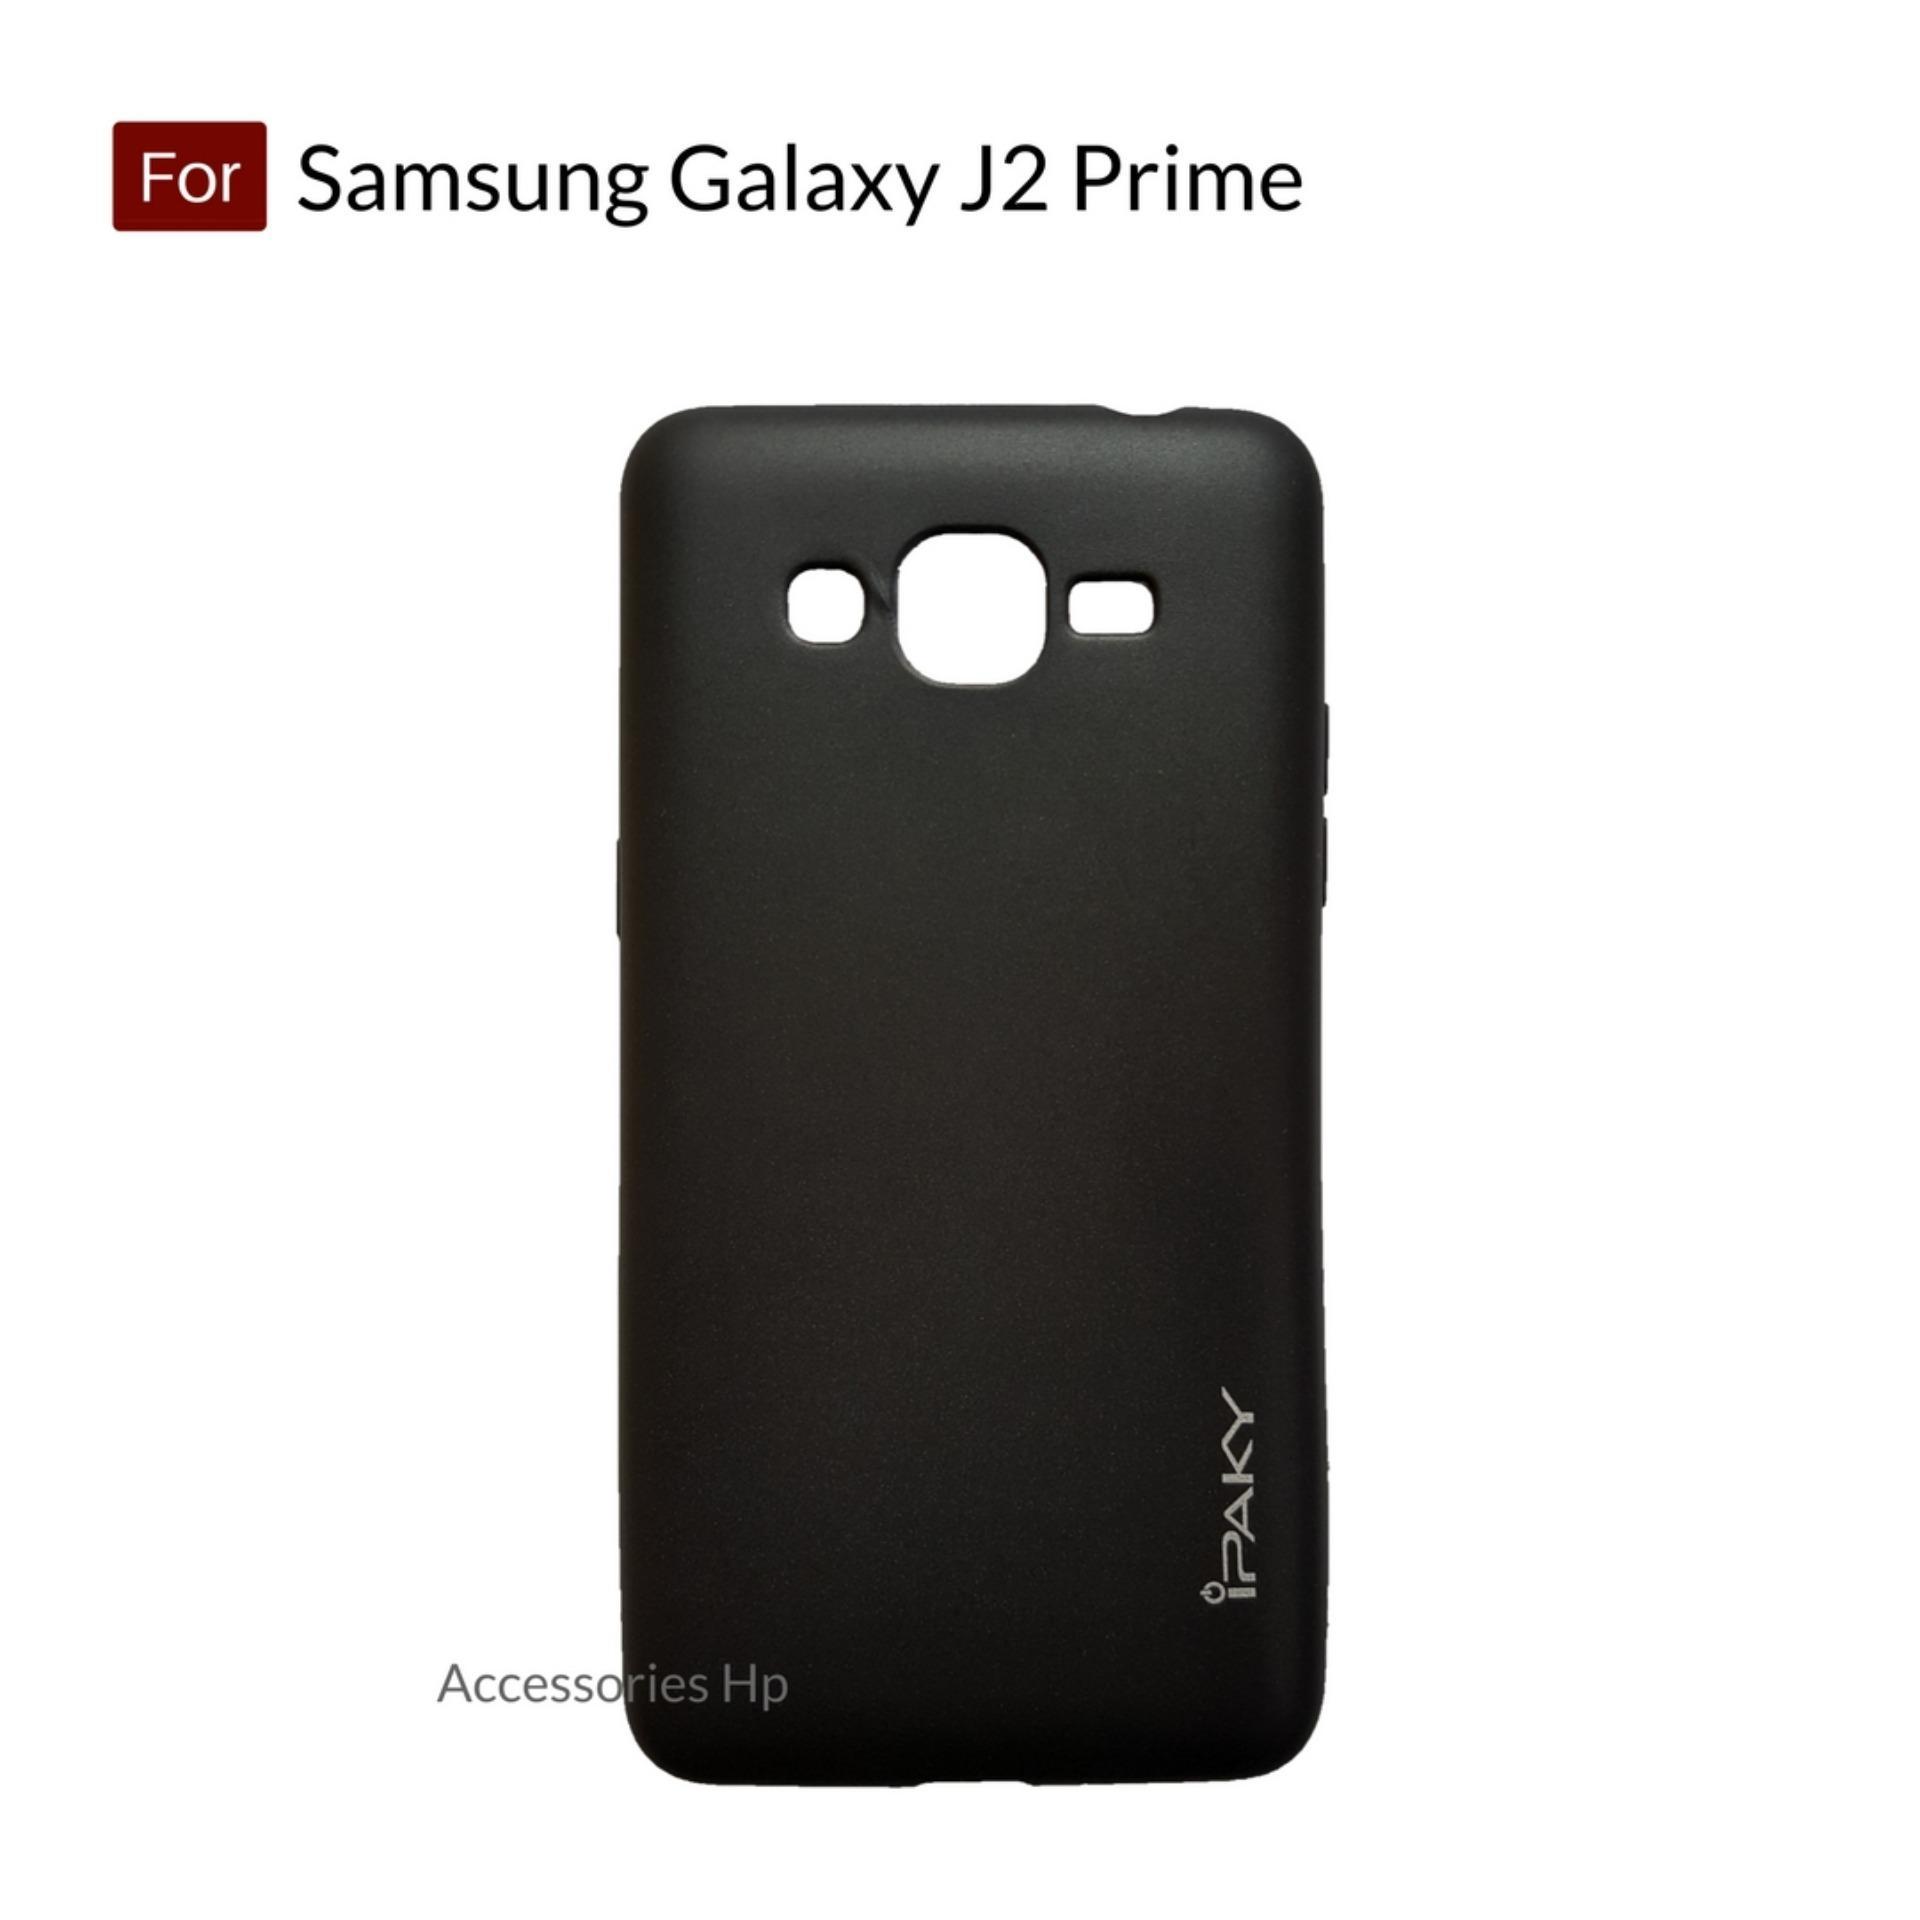 Accessories Hp Ipaky Super Slim Matte Anti Fingerprint Hybrid Case For Samsung Galaxy J2 Prime -